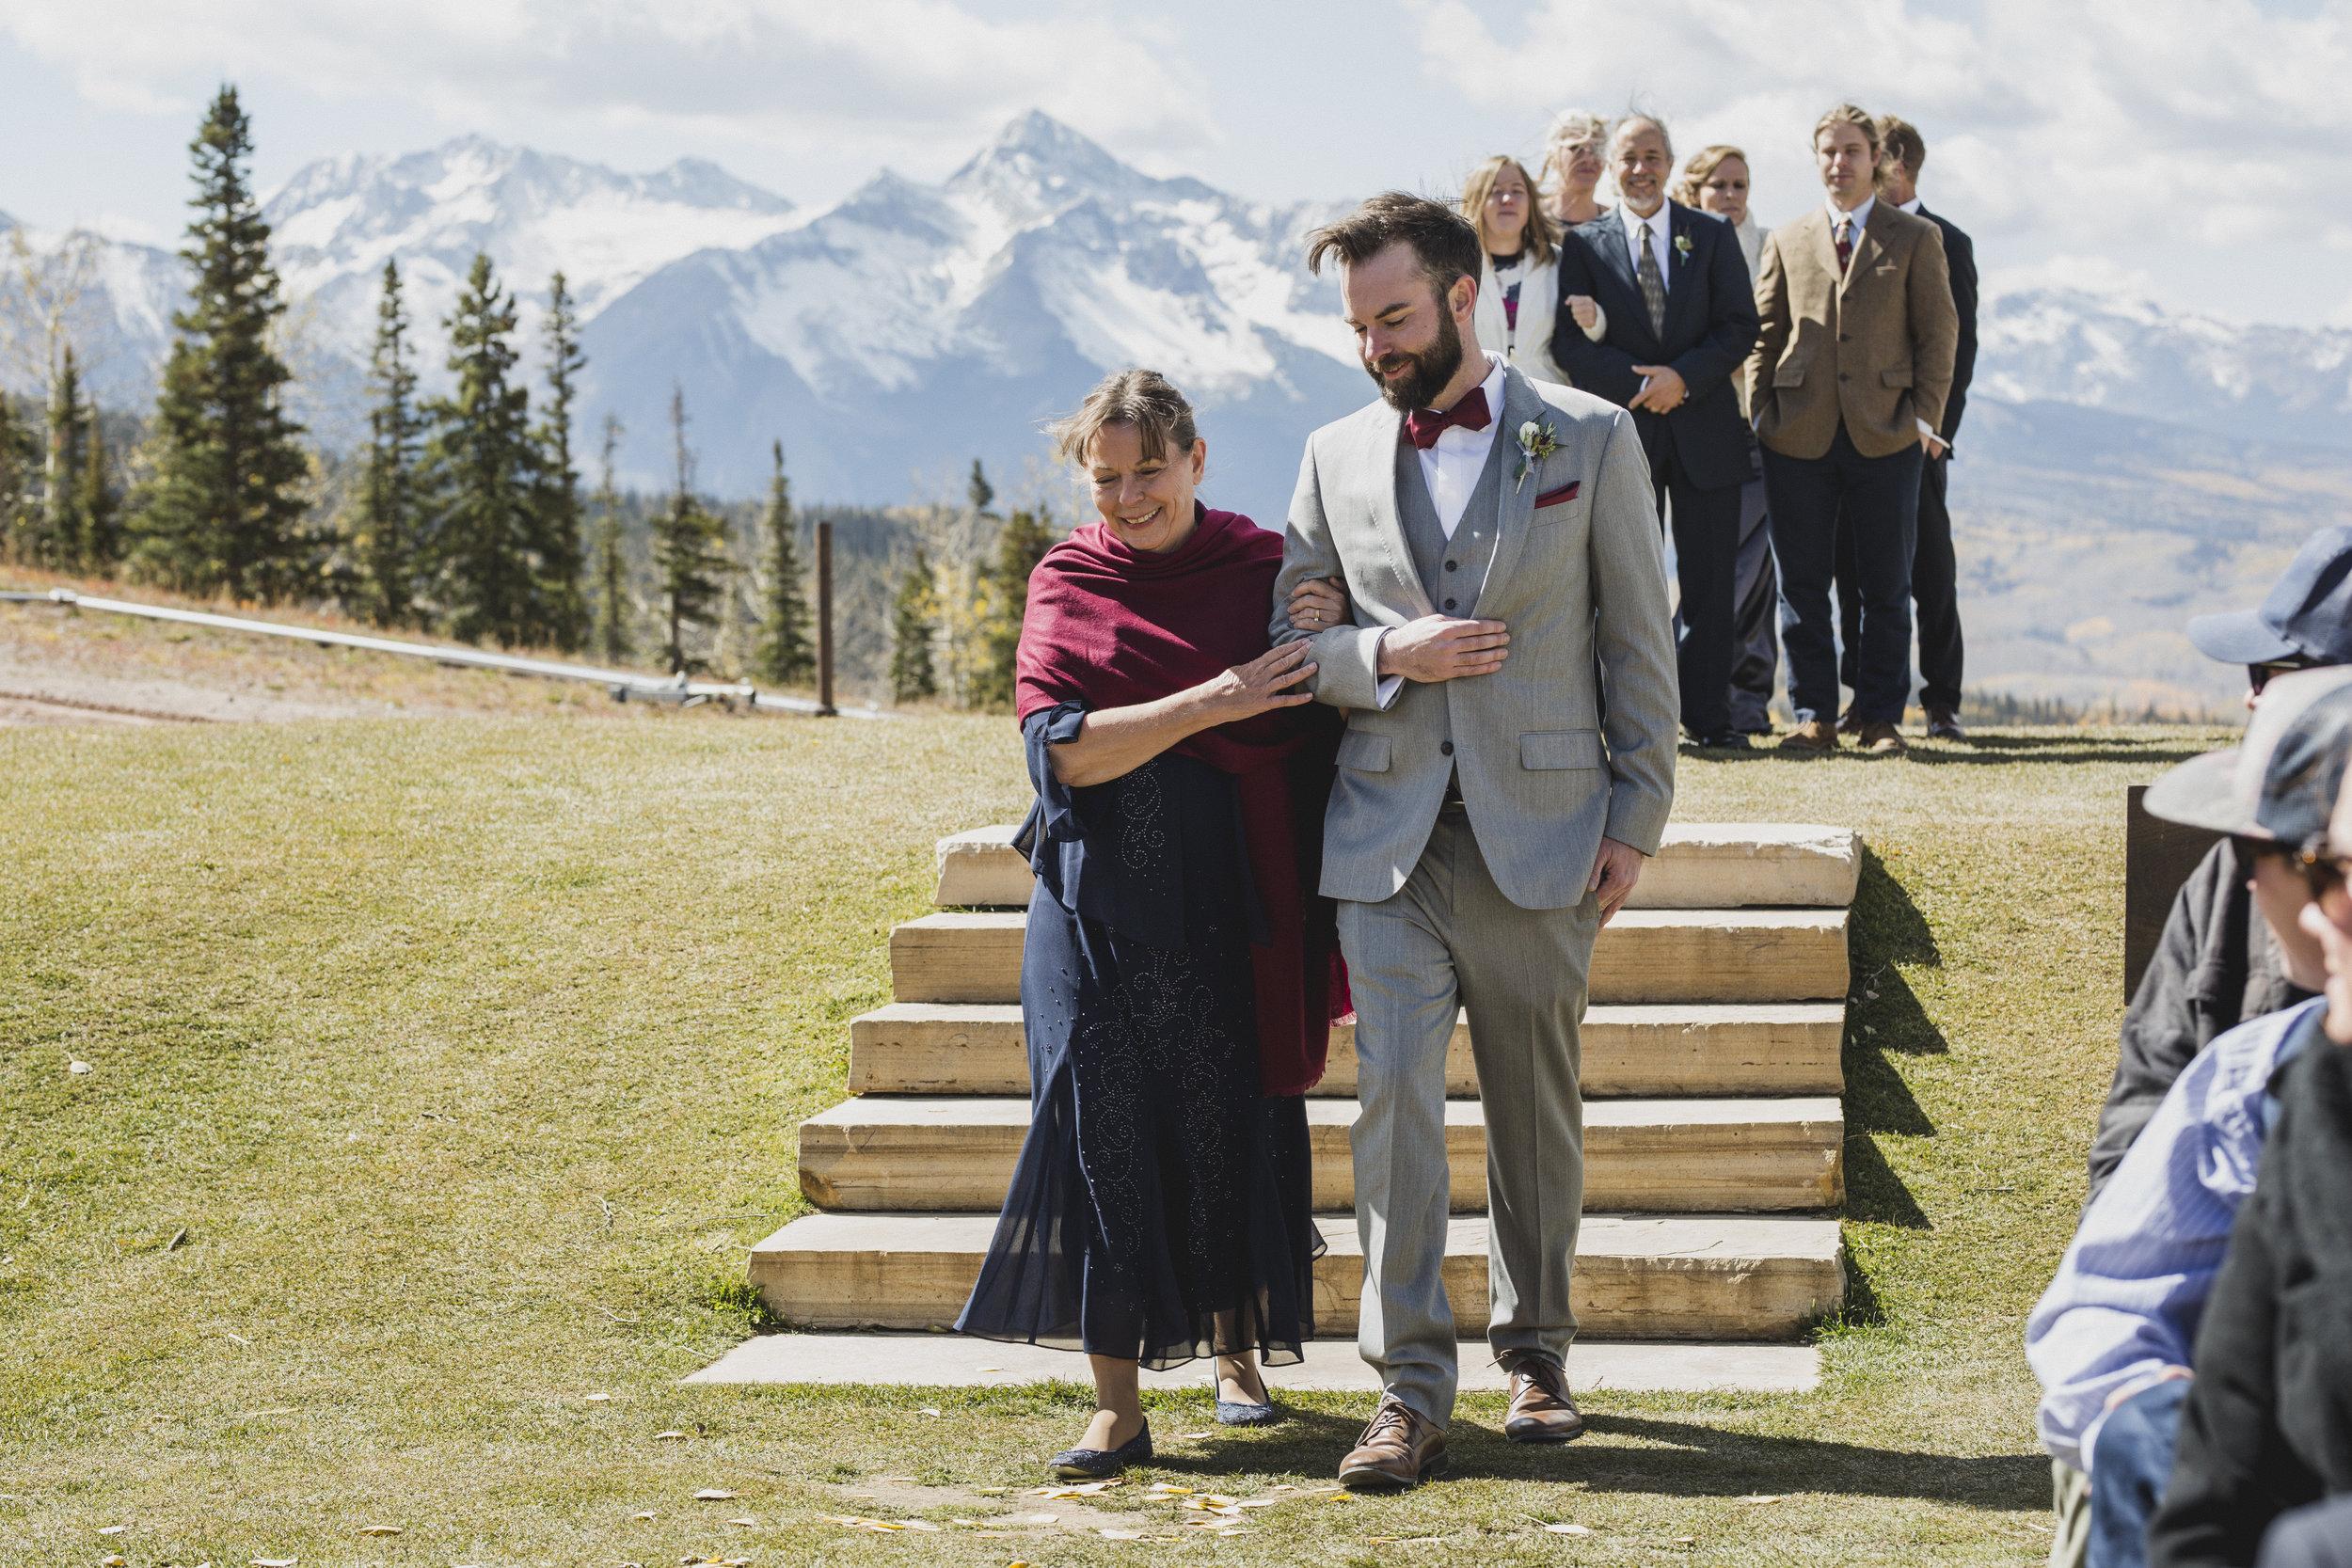 NE-LeahandAshtonphotography-Telluride-Wedding-Photography-9239.jpg